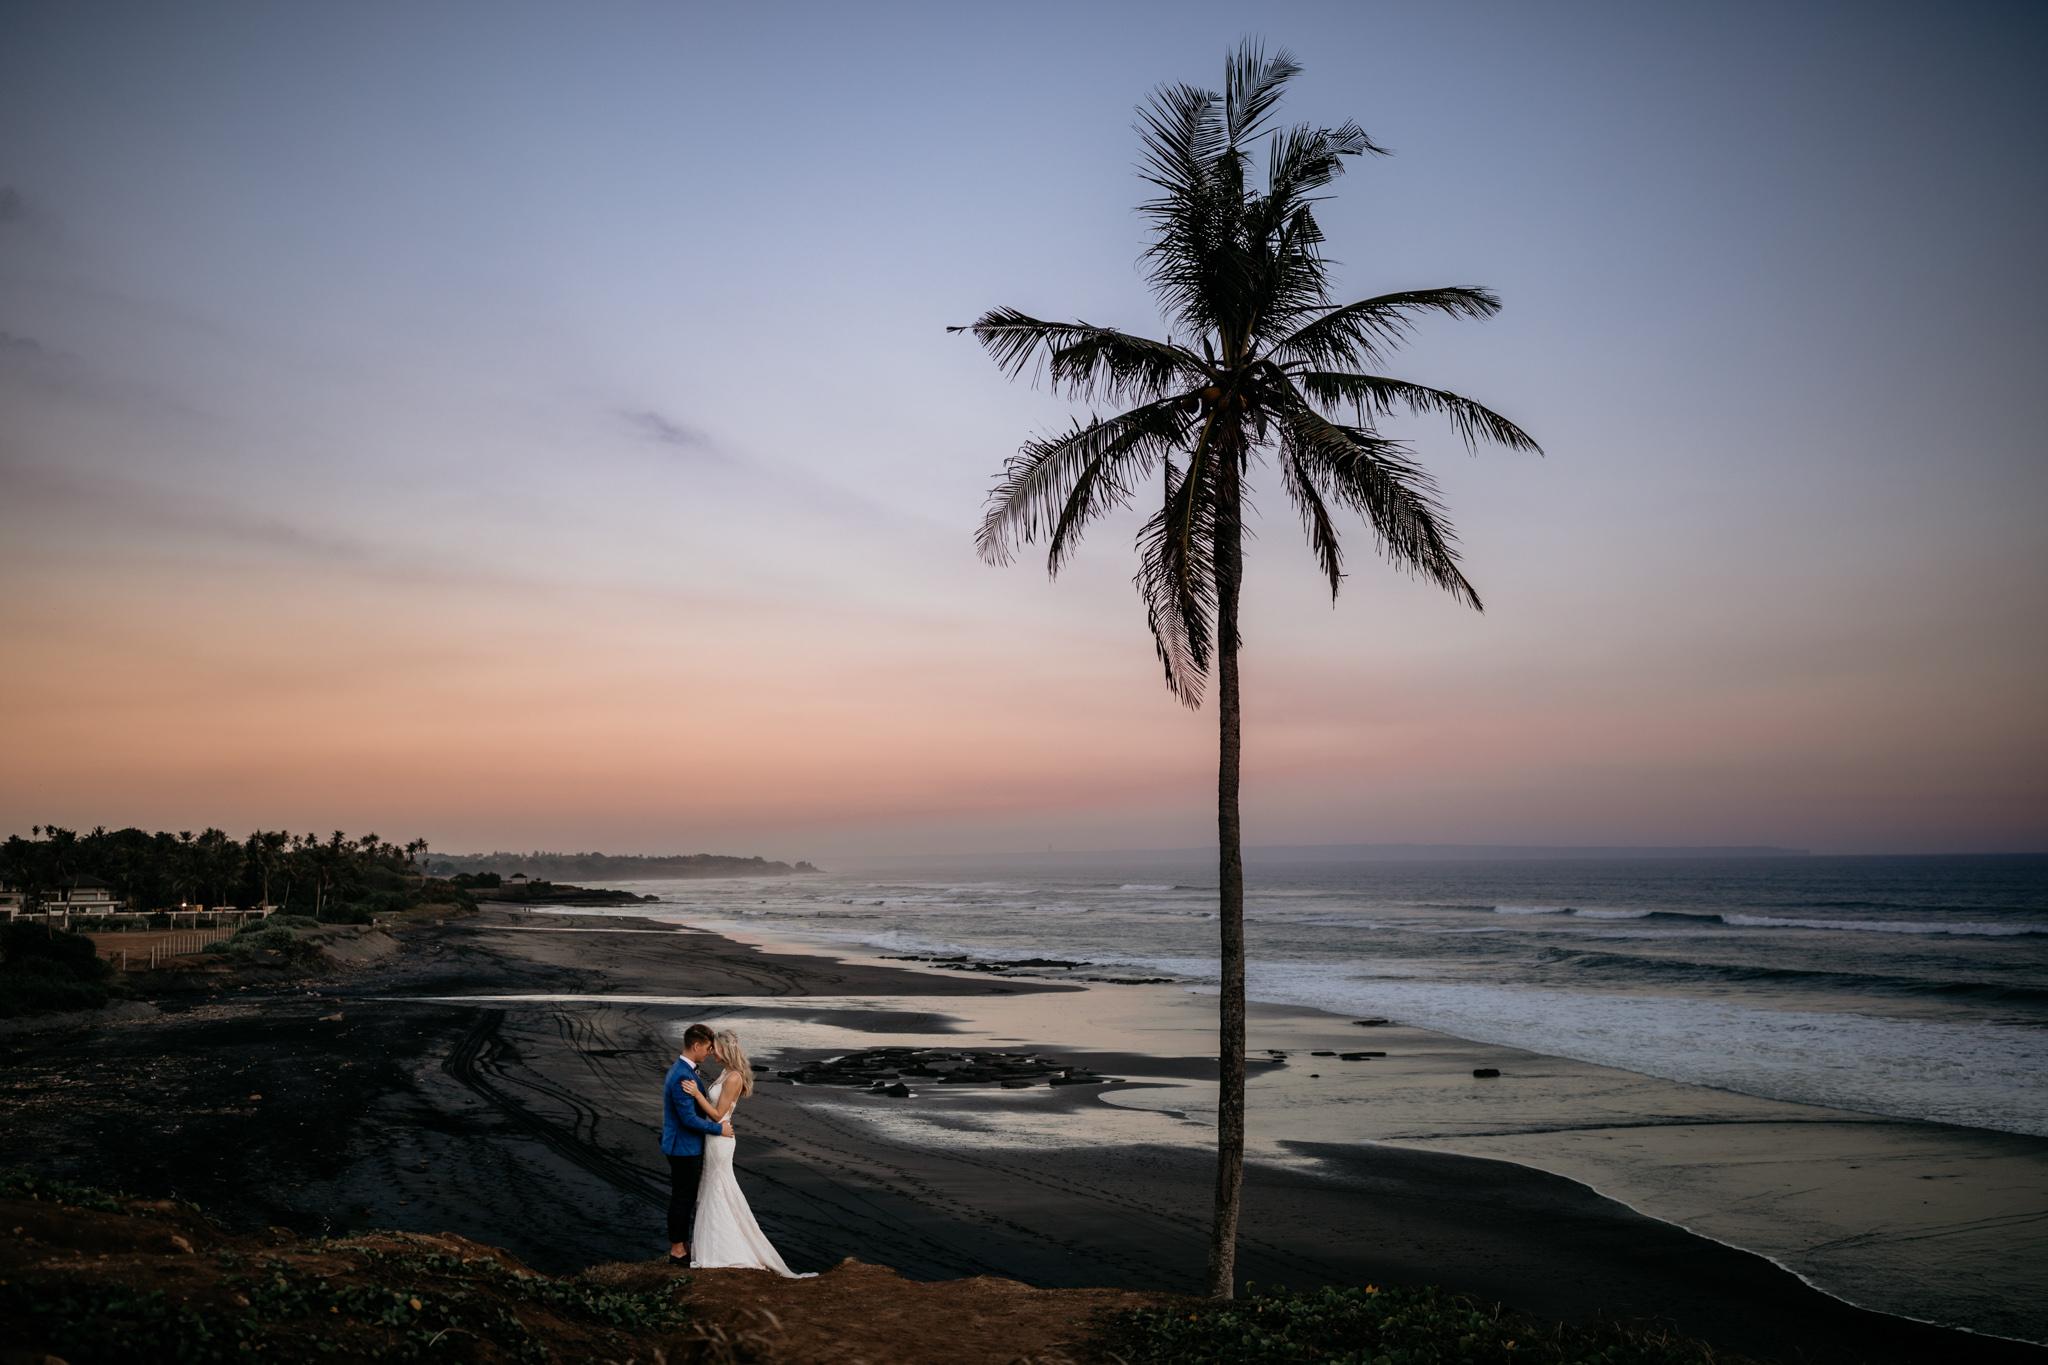 Harry & Abbey - Bali - Villa Vedas, Canggu